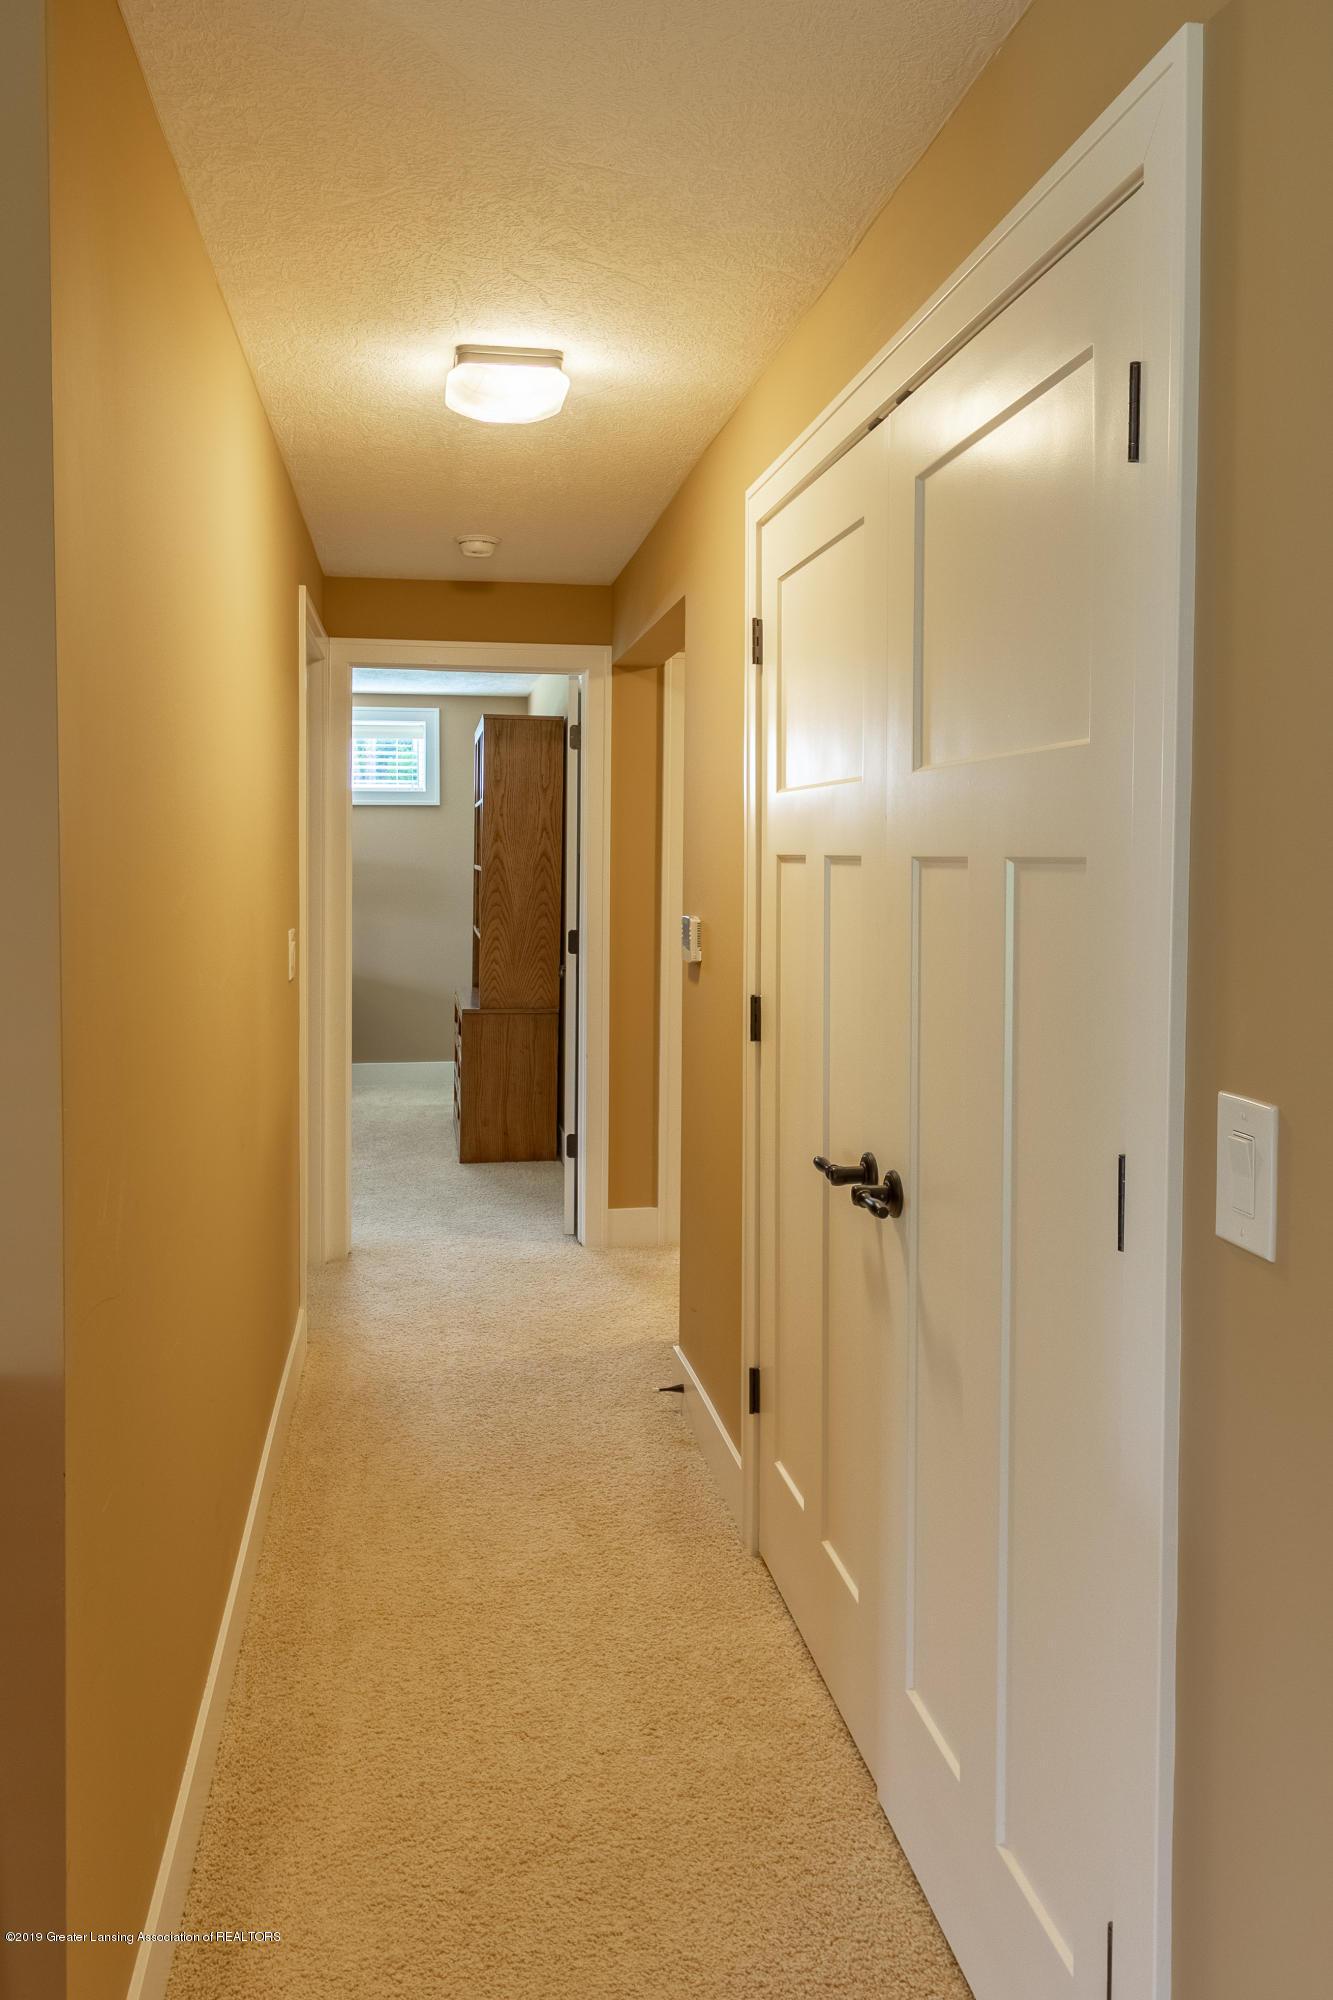 4134 E Benca Way - Lower Level Hallway - 52